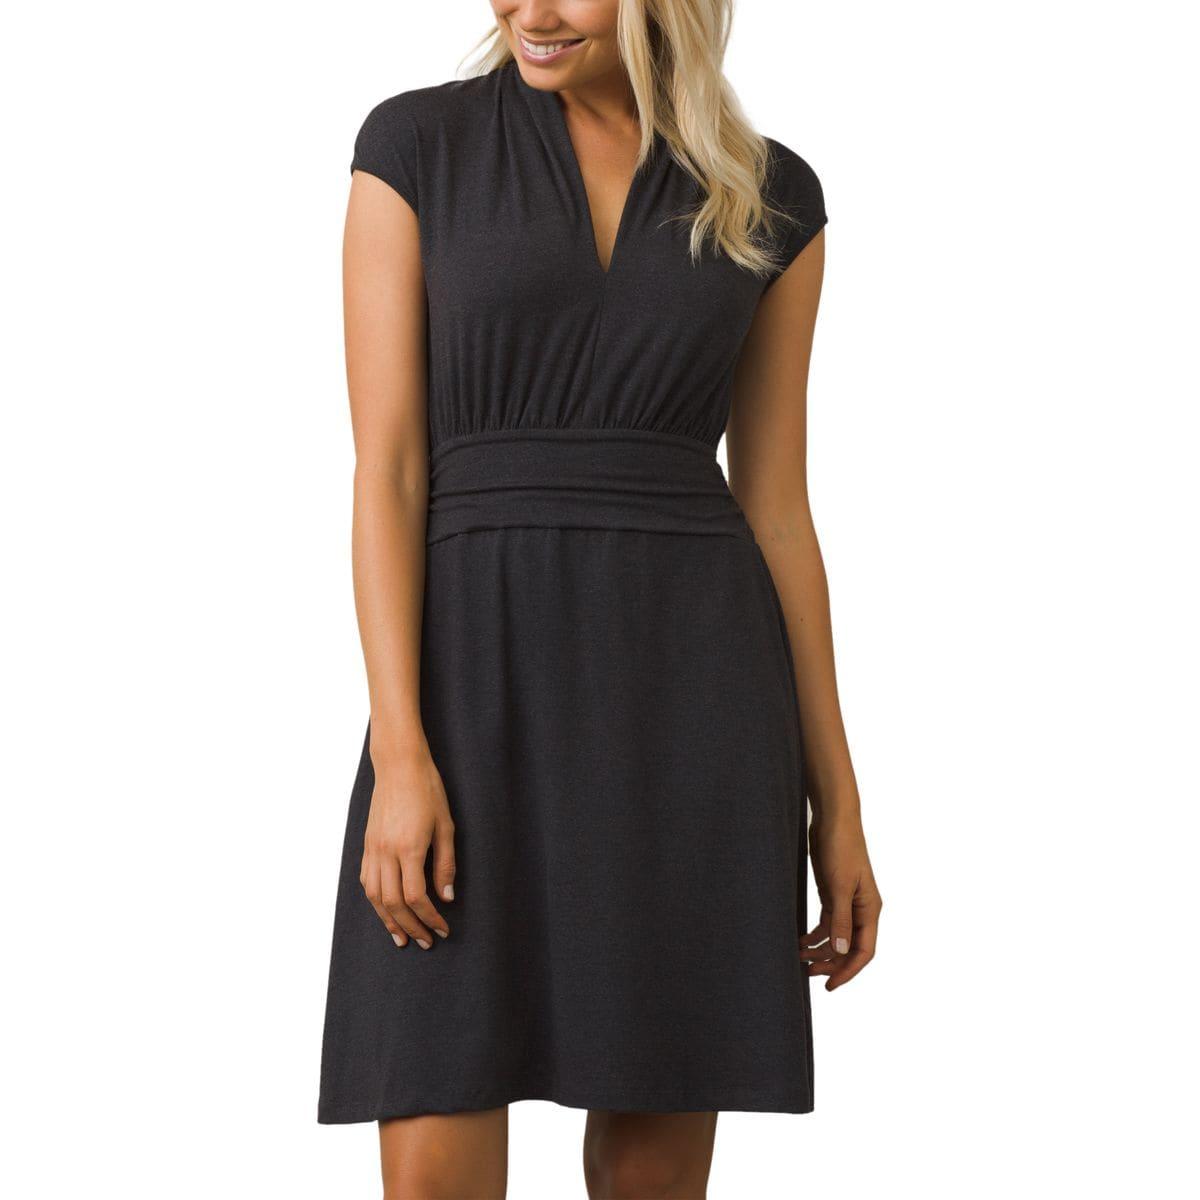 Prana Berry Dress - Women